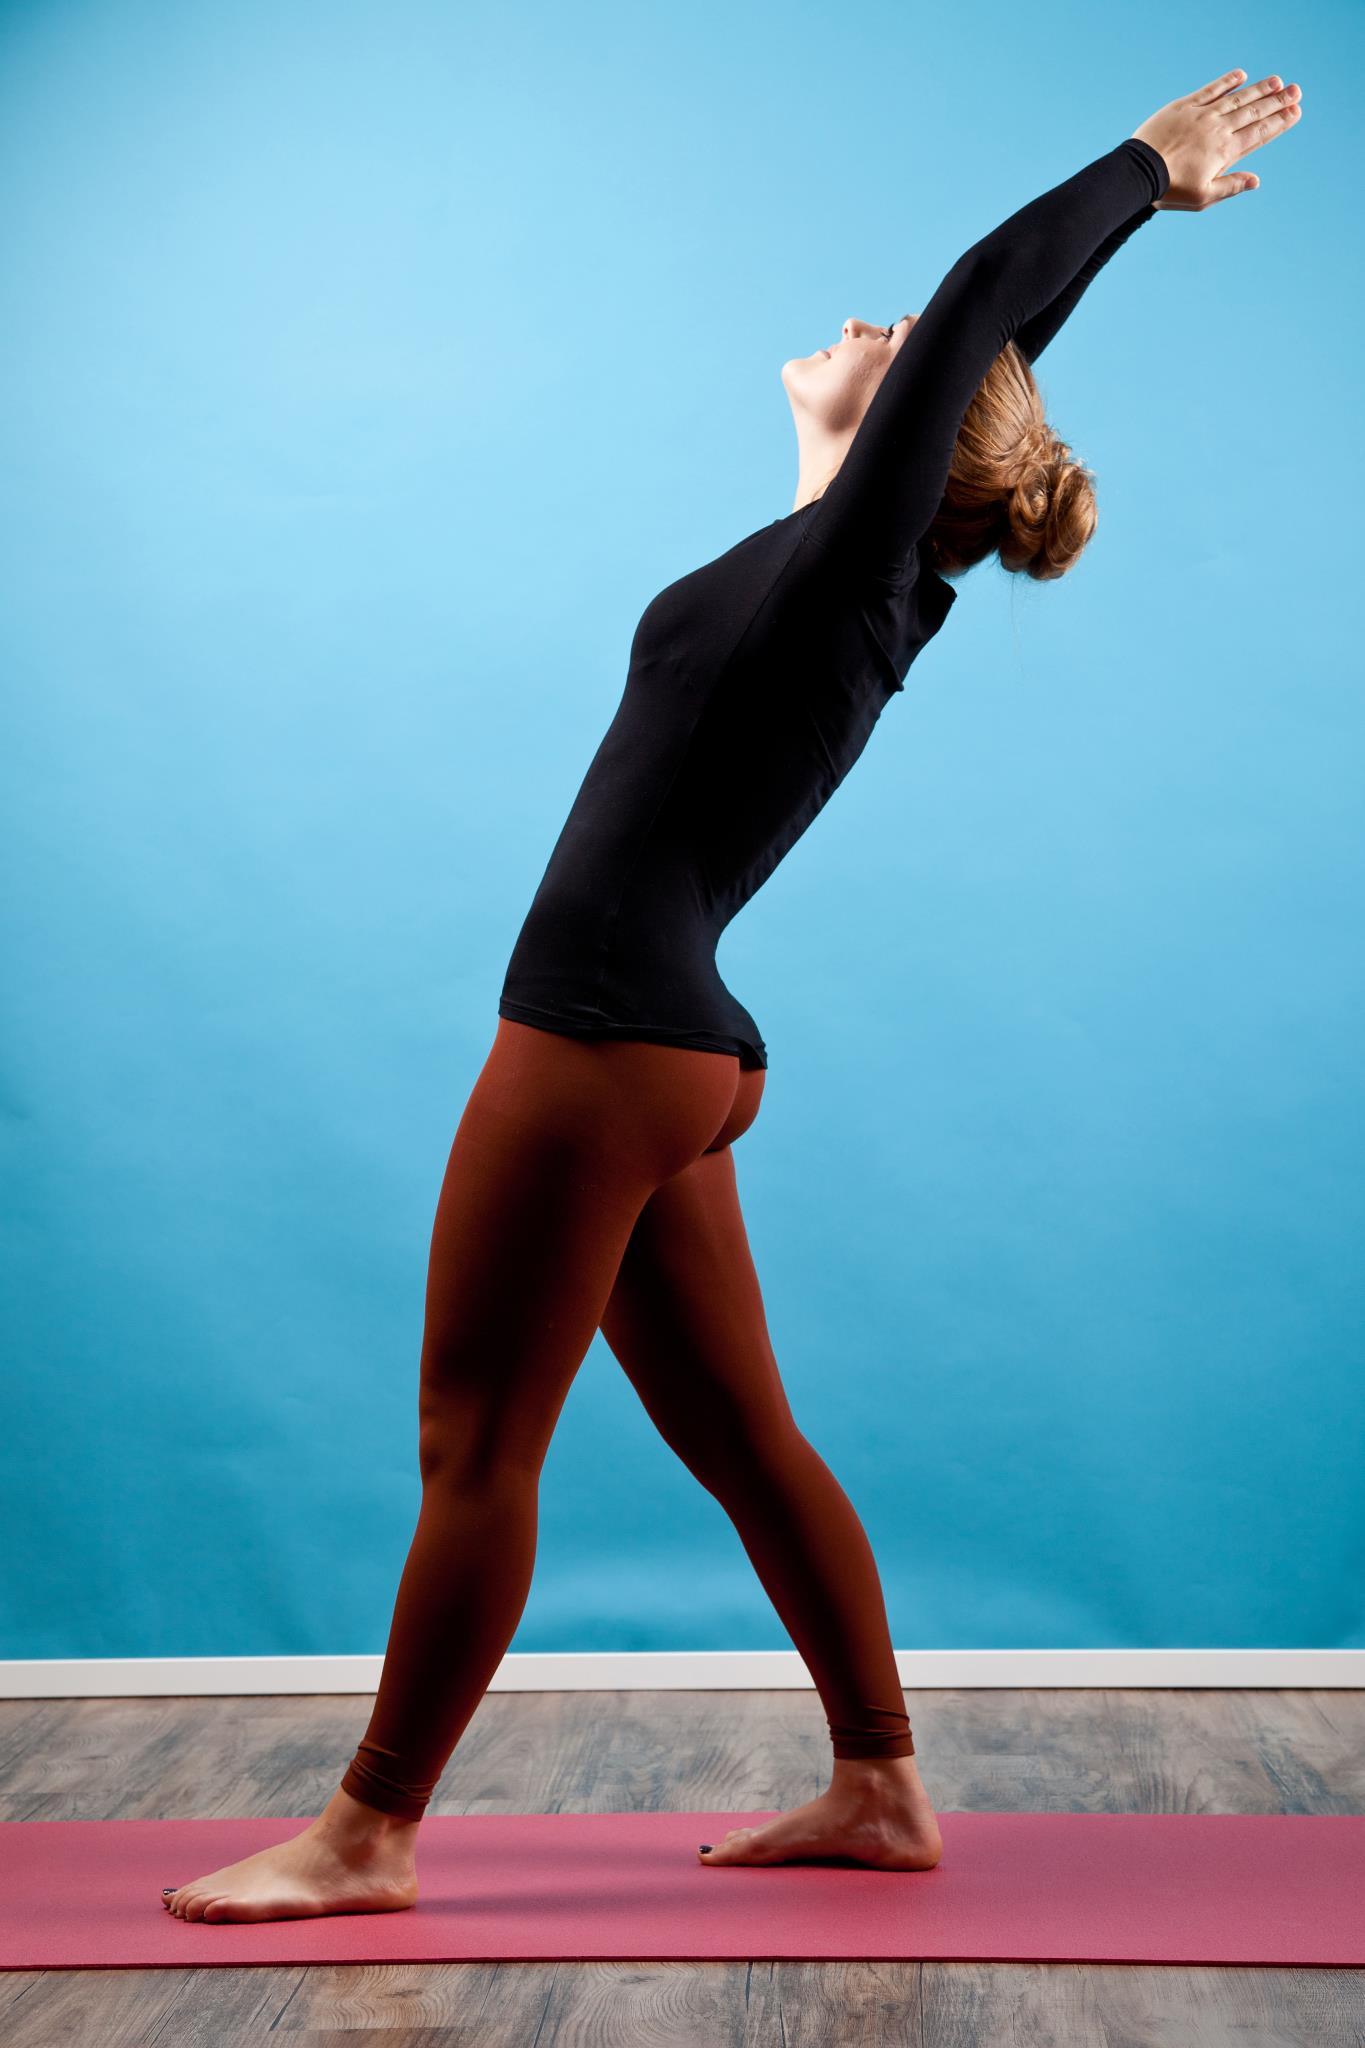 the gallery for gt zendaya in yoga pants